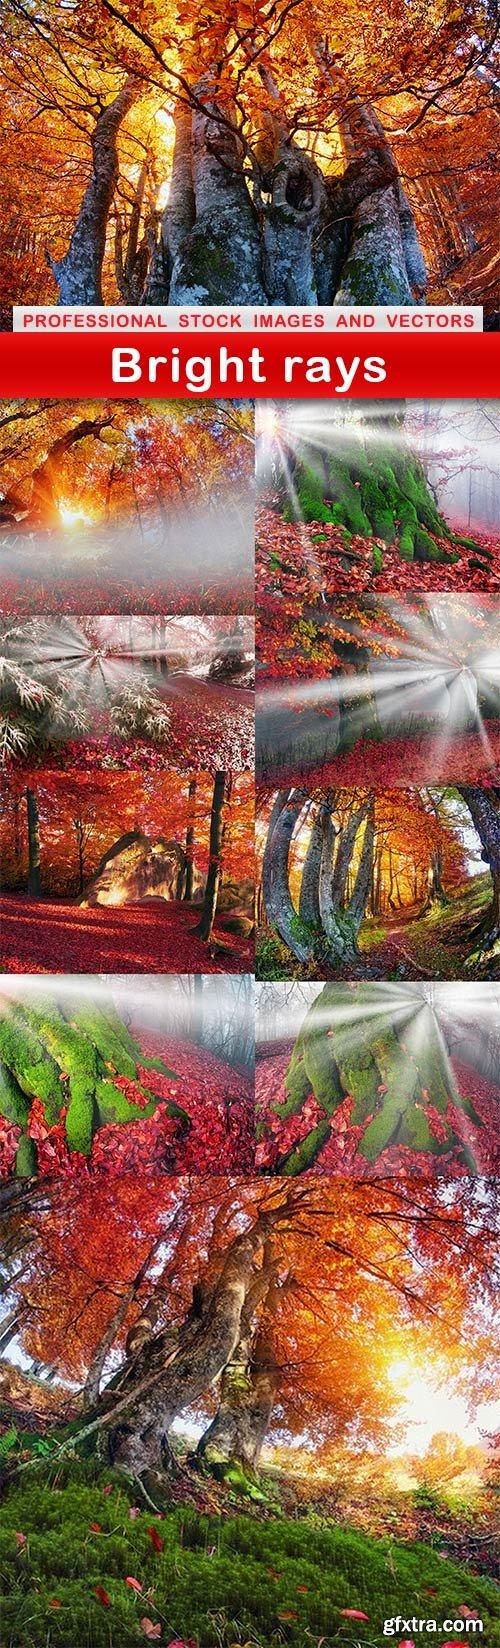 Bright rays - 10 UHQ JPEG